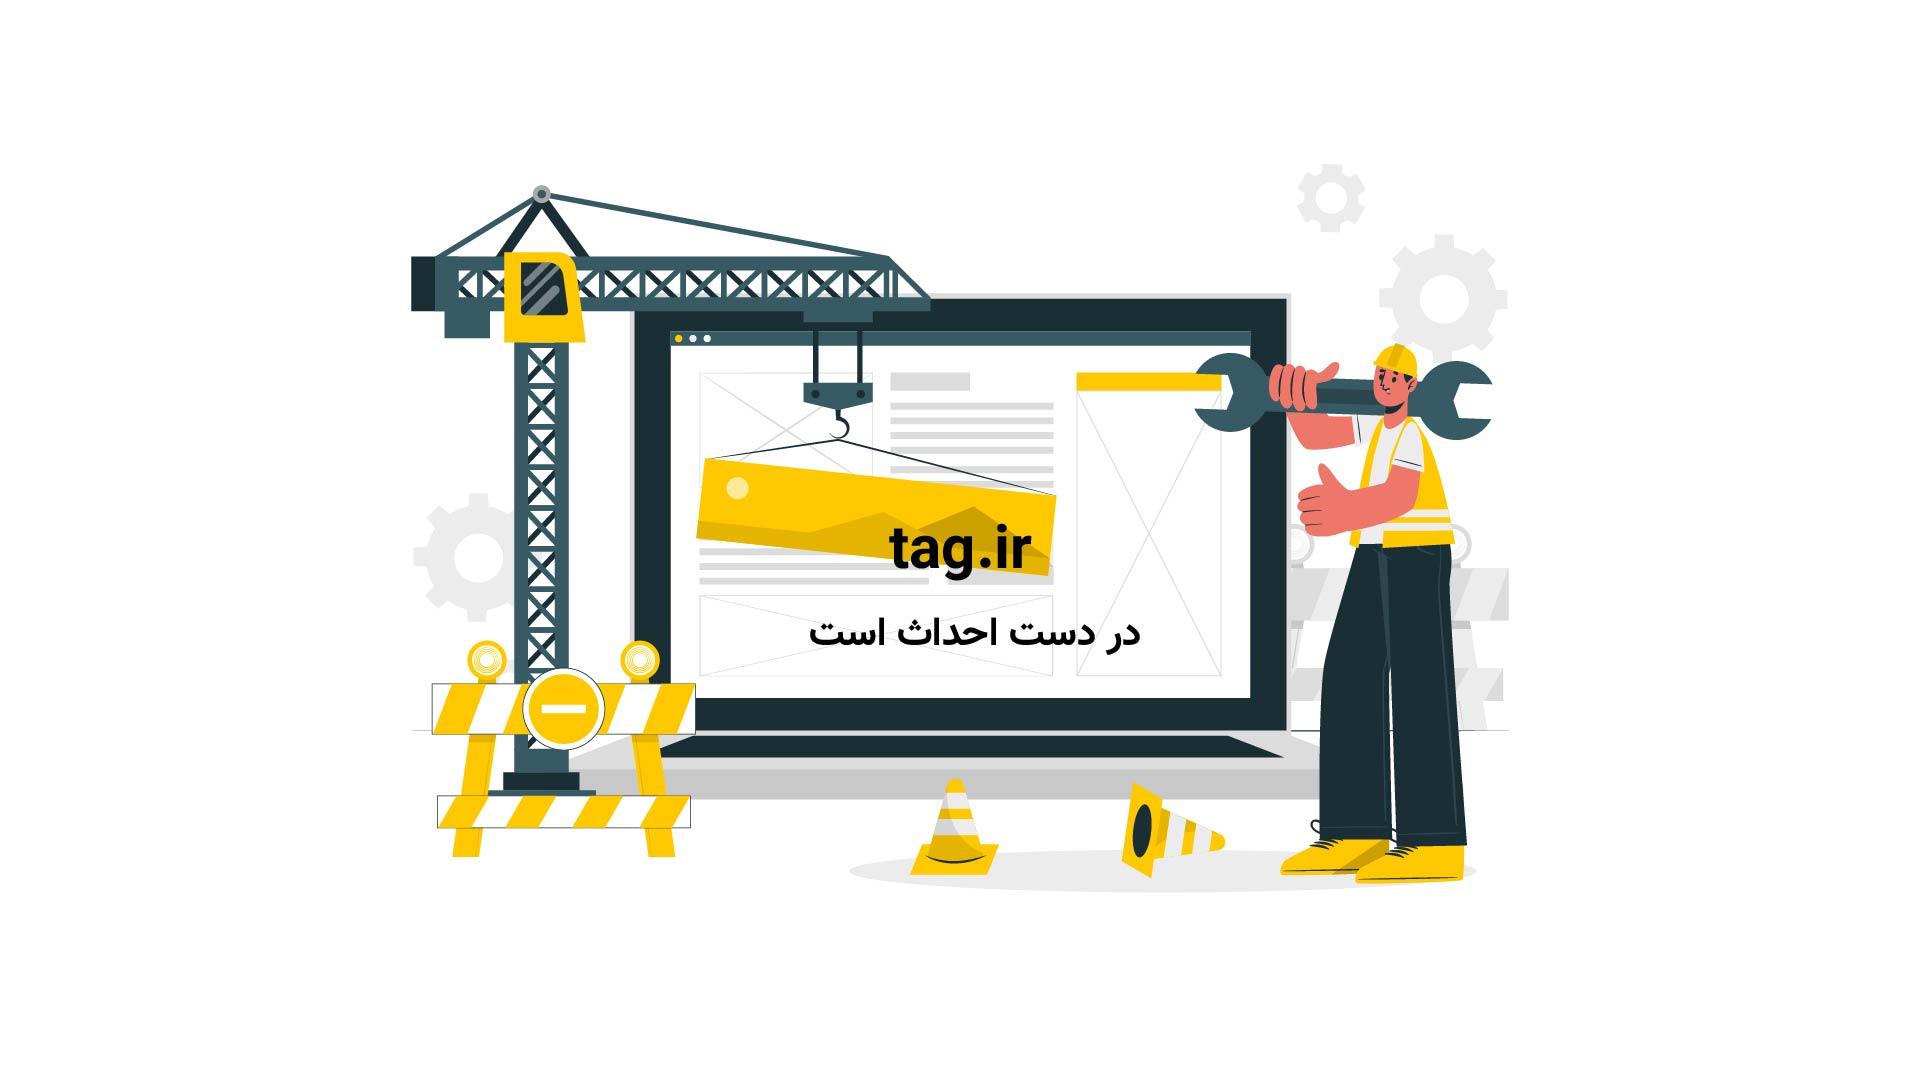 محمدرضا جوادی یگانه | تگ